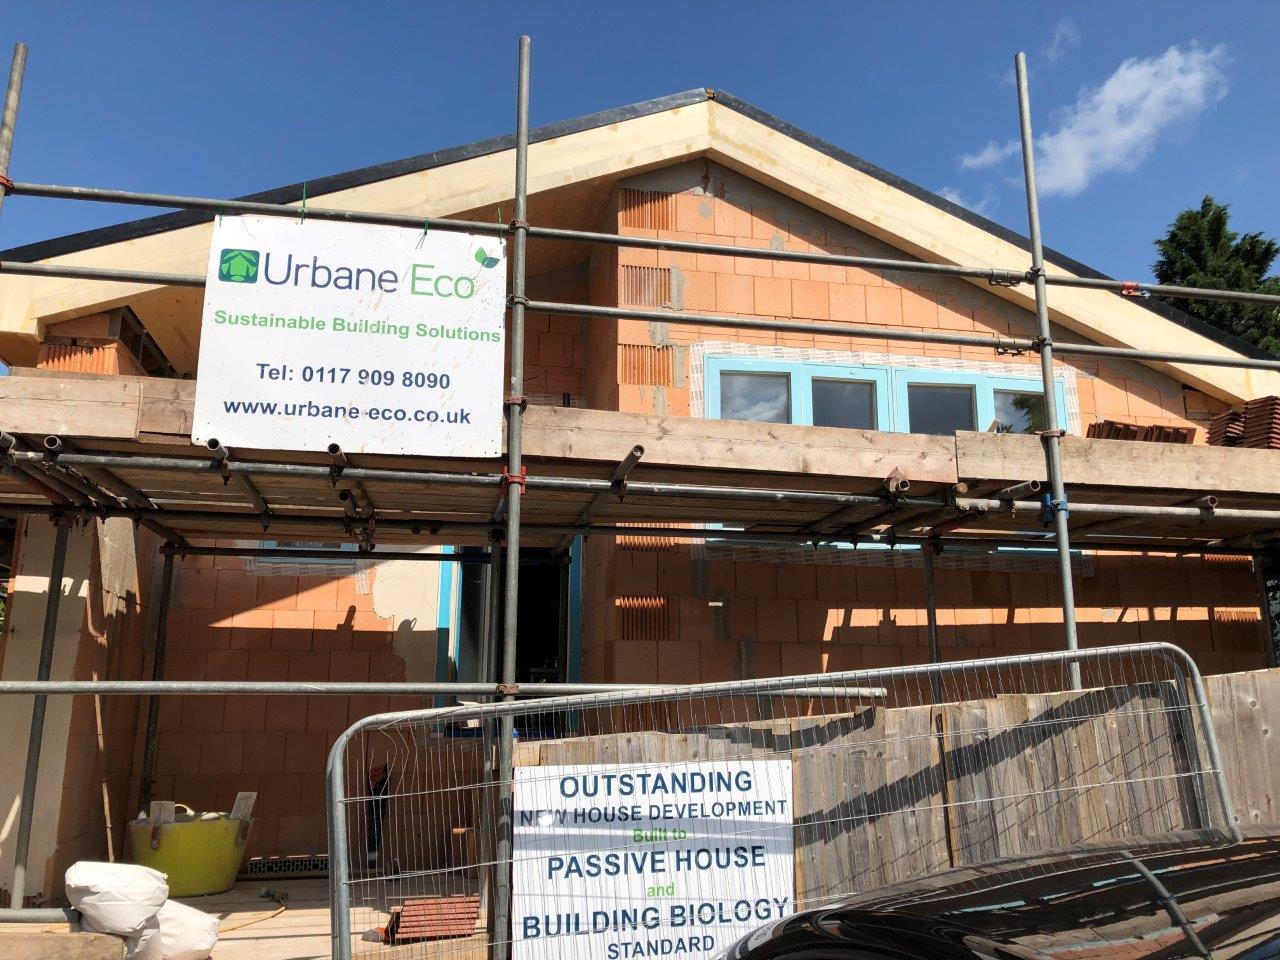 Bristol based sustainable building specialists Urbane Eco